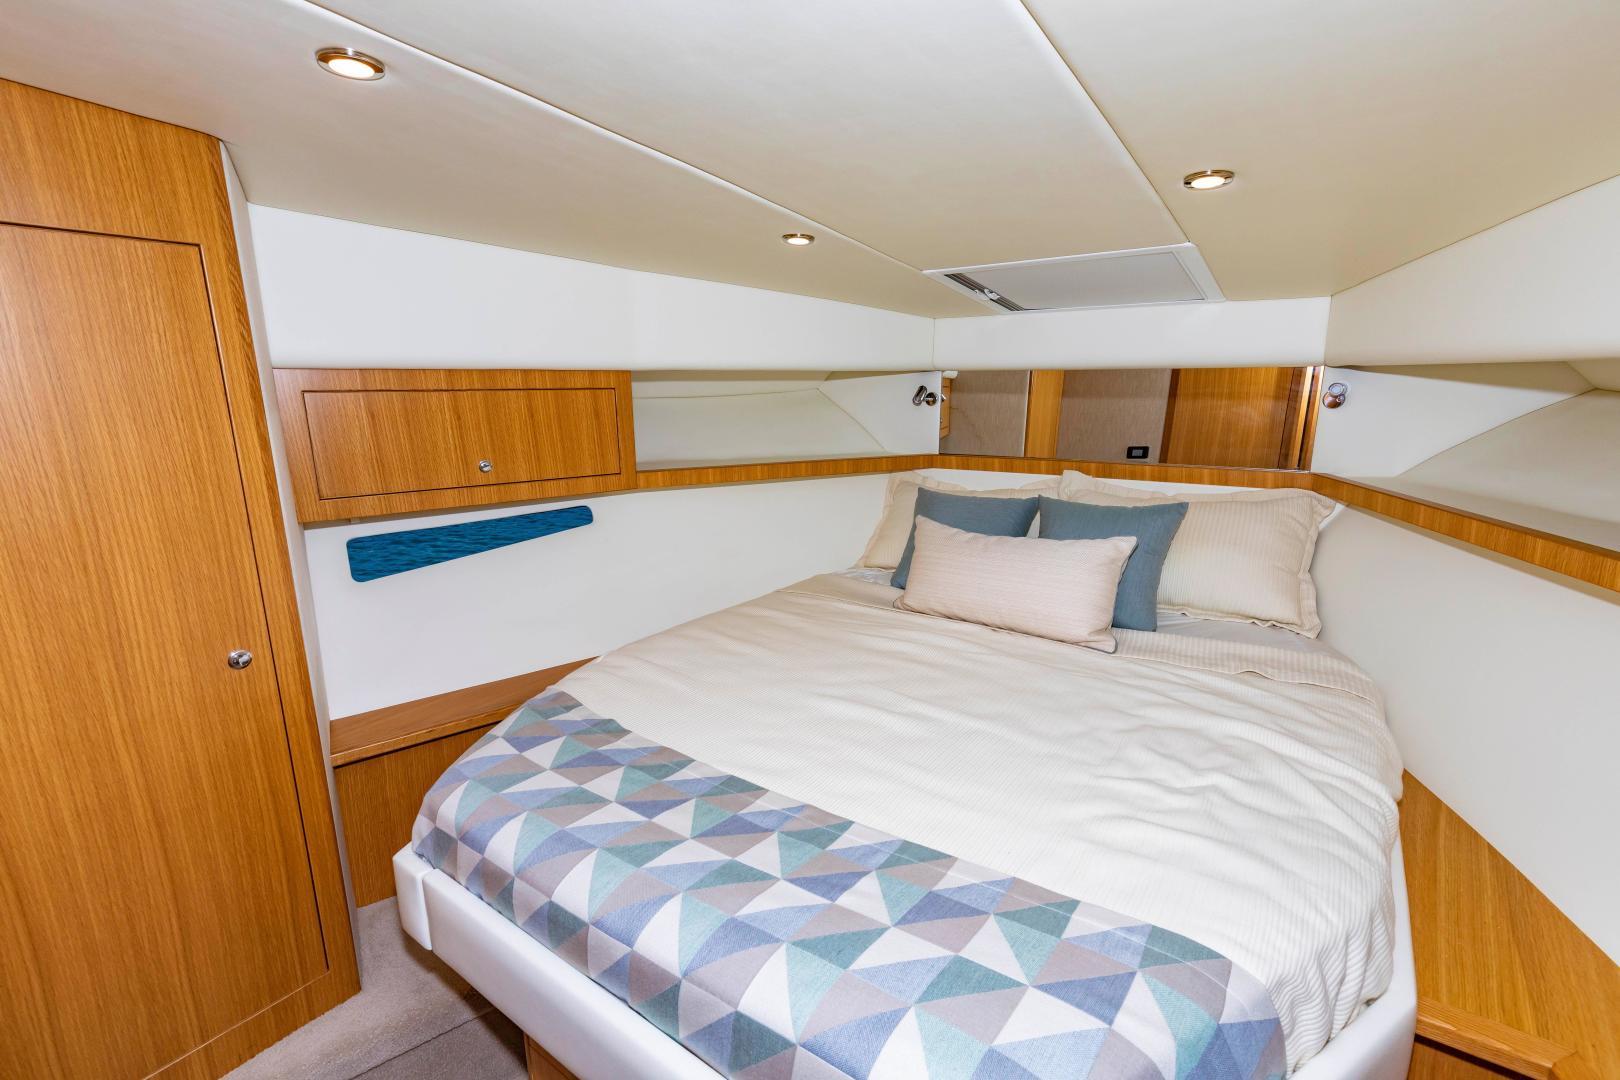 Riviera-395 SUV 2019-Ipanema Miami Beach-Florida-United States-1614909   Thumbnail